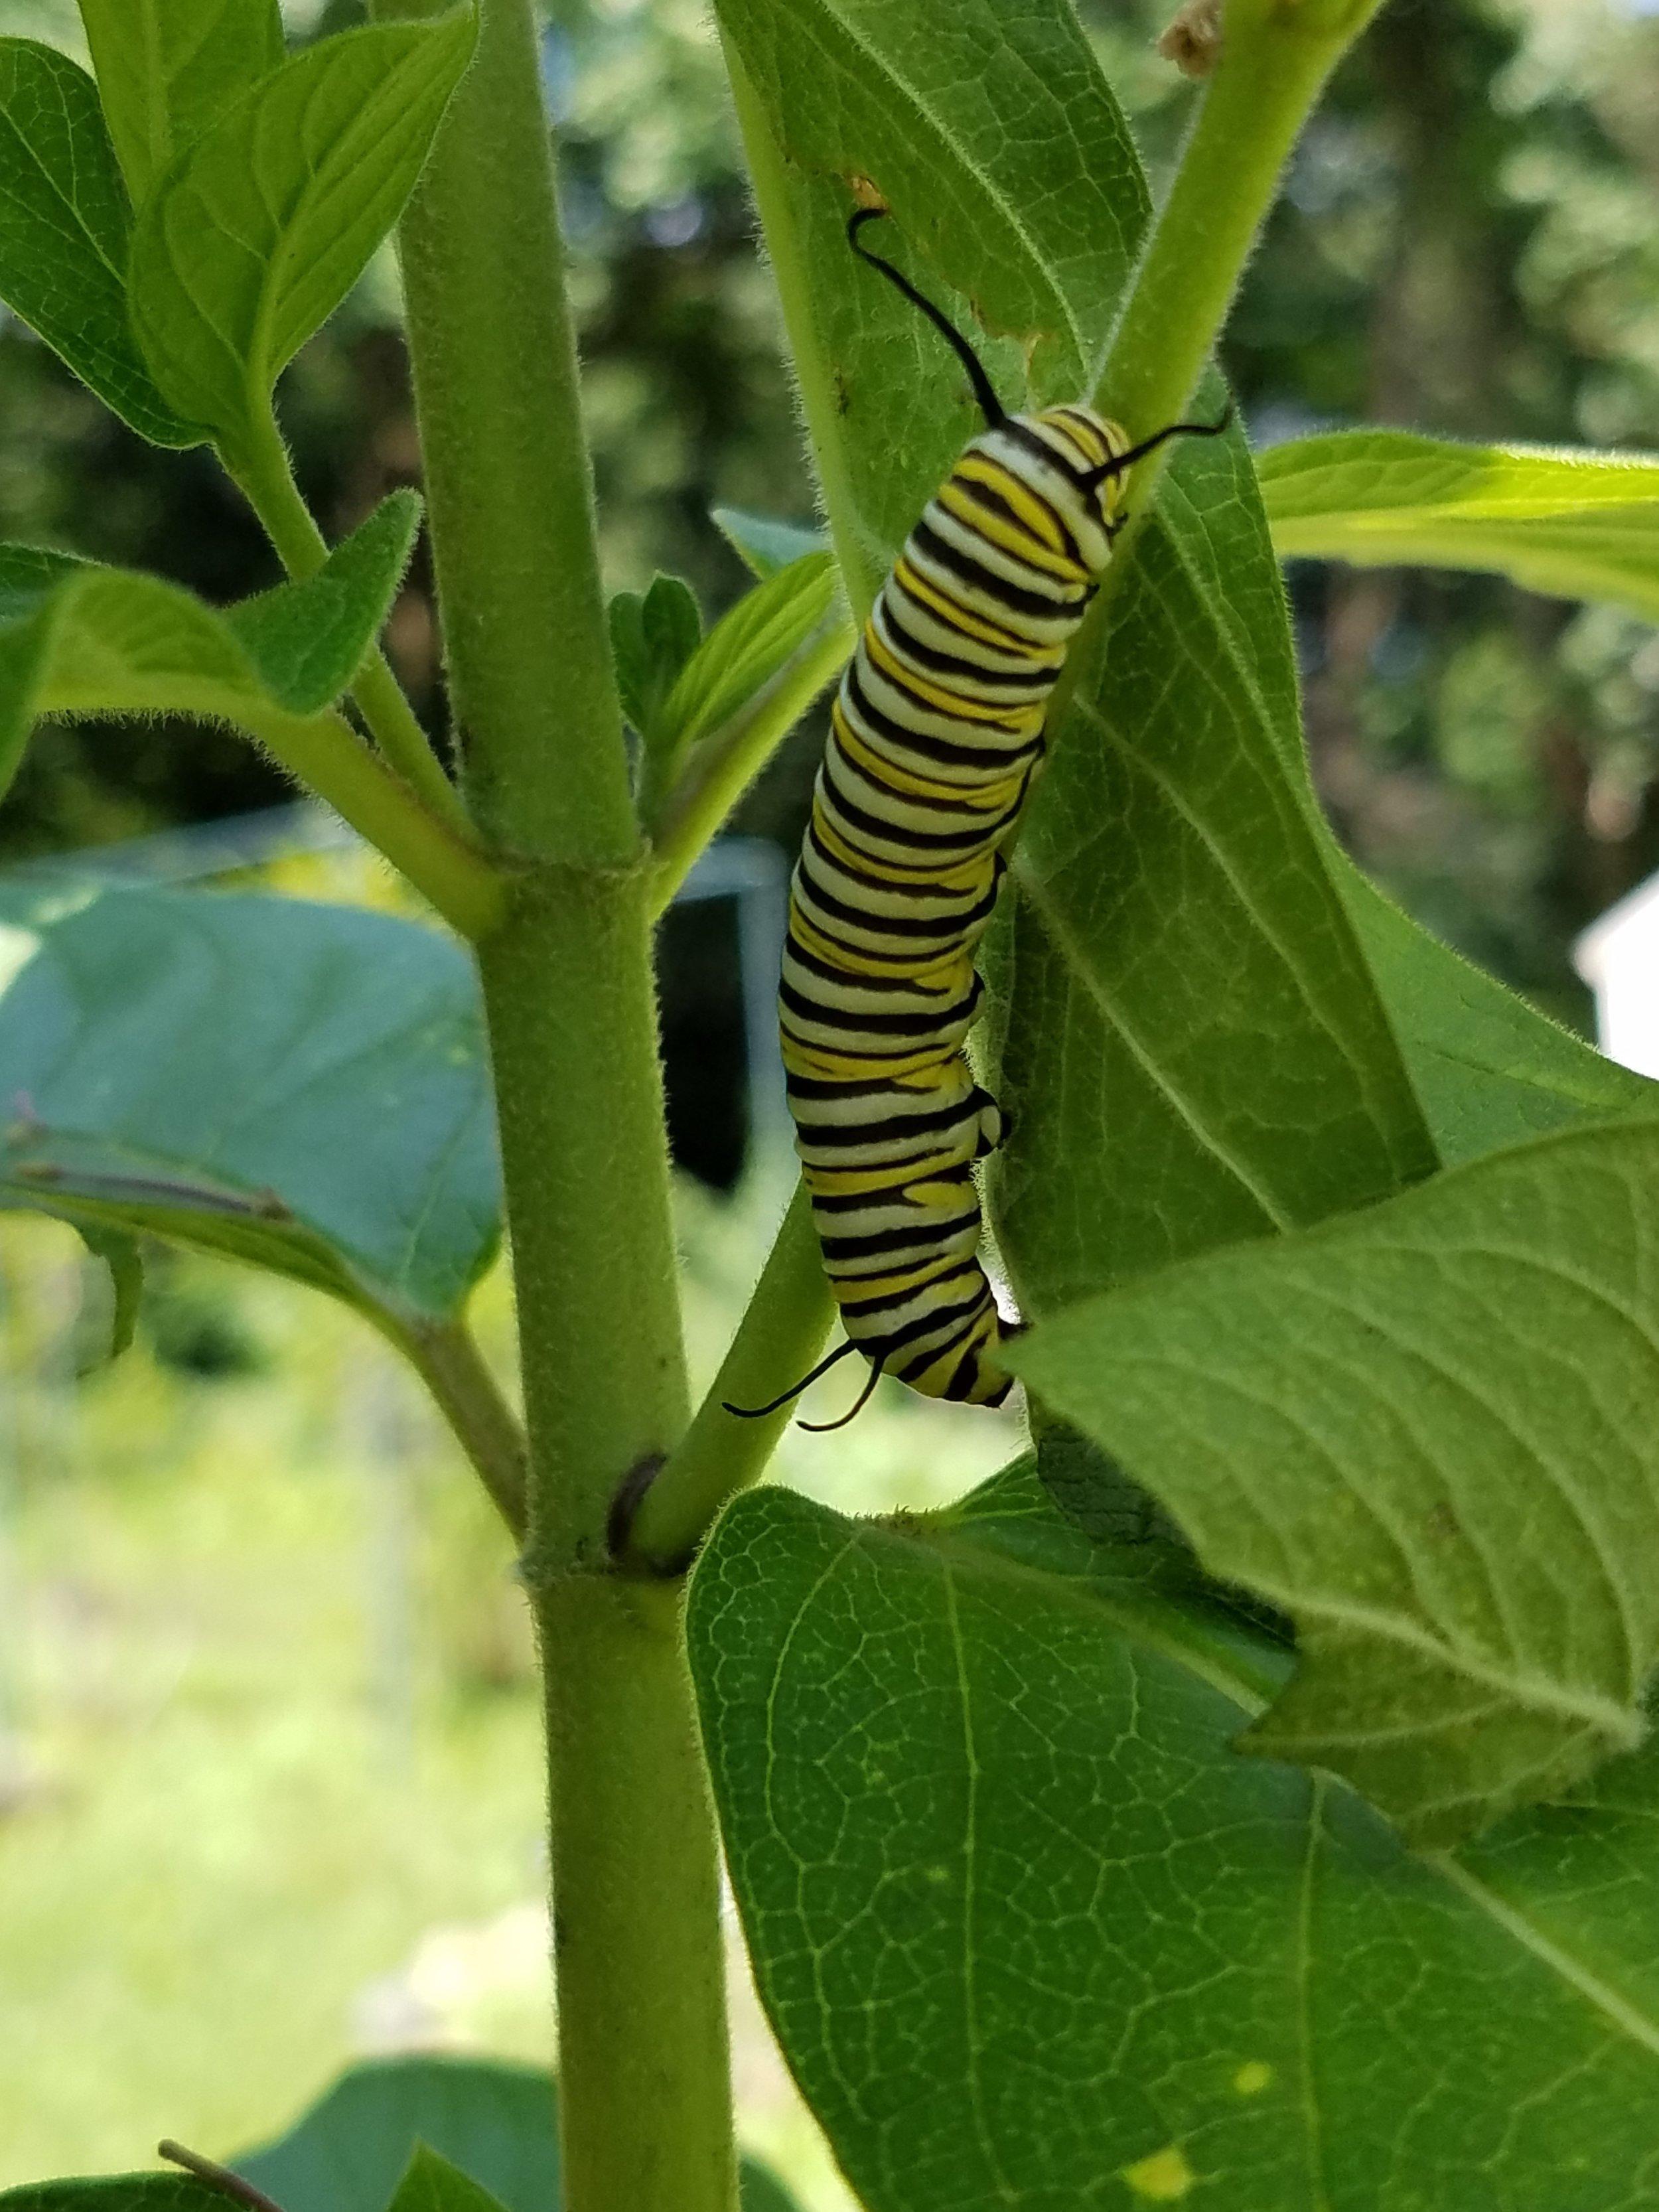 20180809_Monarch Caterpillar on Milkweed.jpg